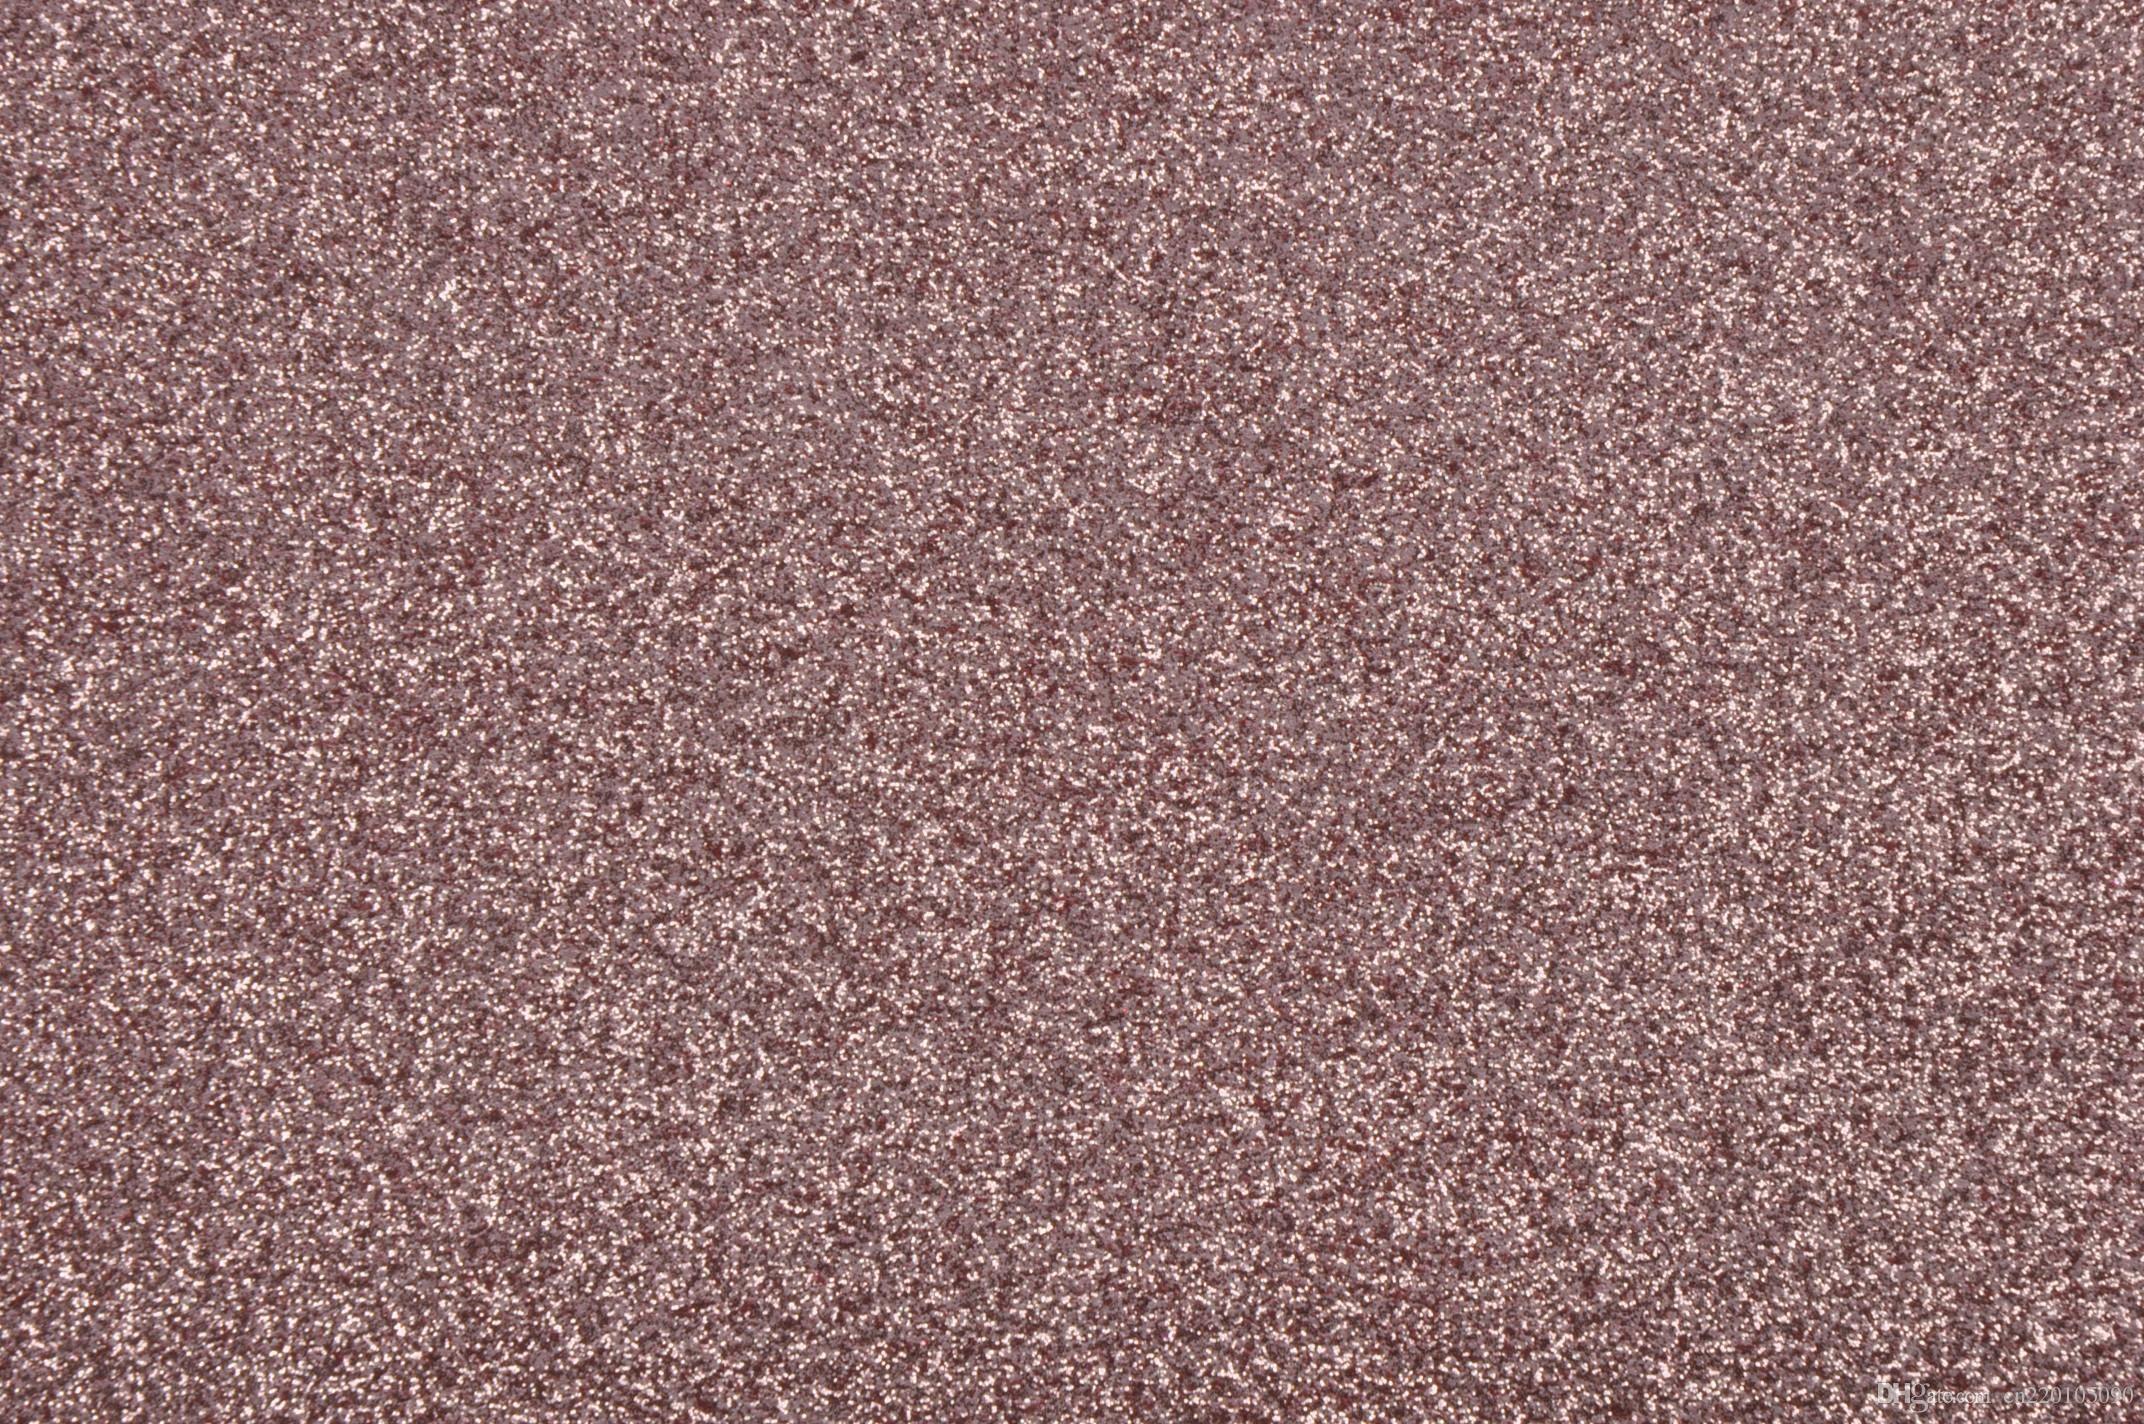 JC Pack eco-friendly red glitter wallpaper , champagne glitter fabric ,  vinyl glitter leather